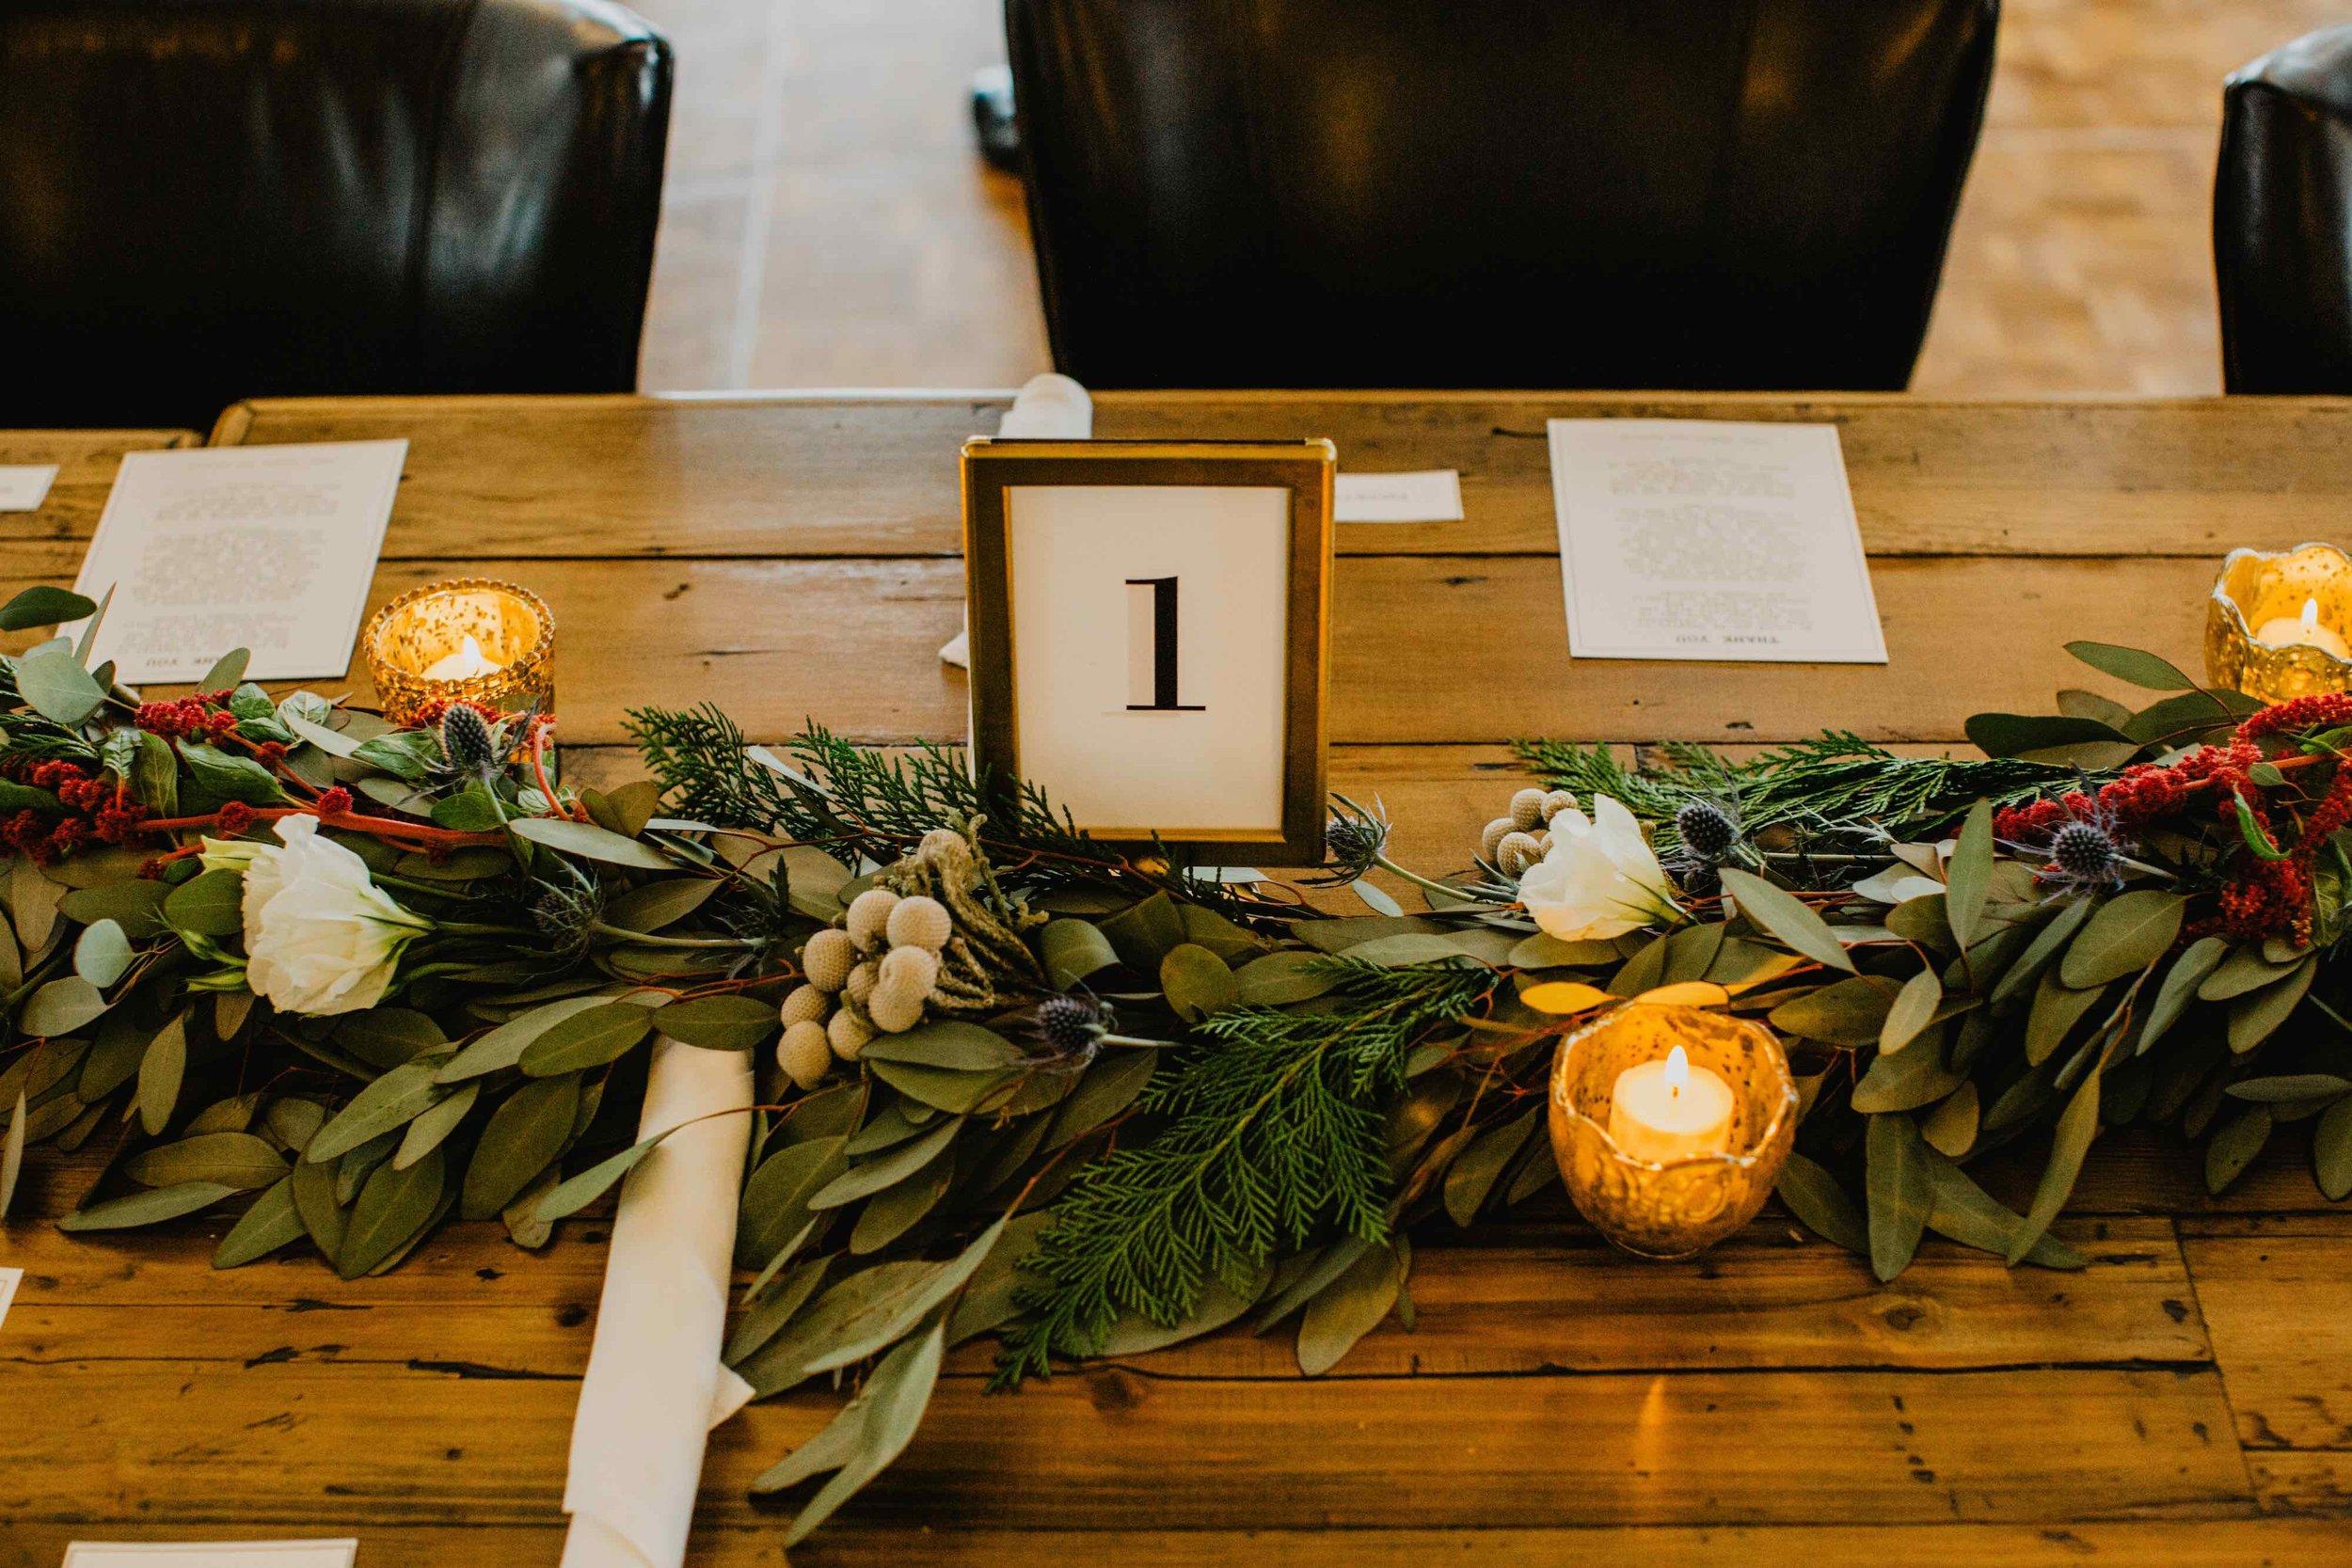 Kisa Conrad Favorites-0058-colorado-wedding-photographer-denver-springs-vailhotel-glenwood-springs-colorado-wedding-photographer.jpeg